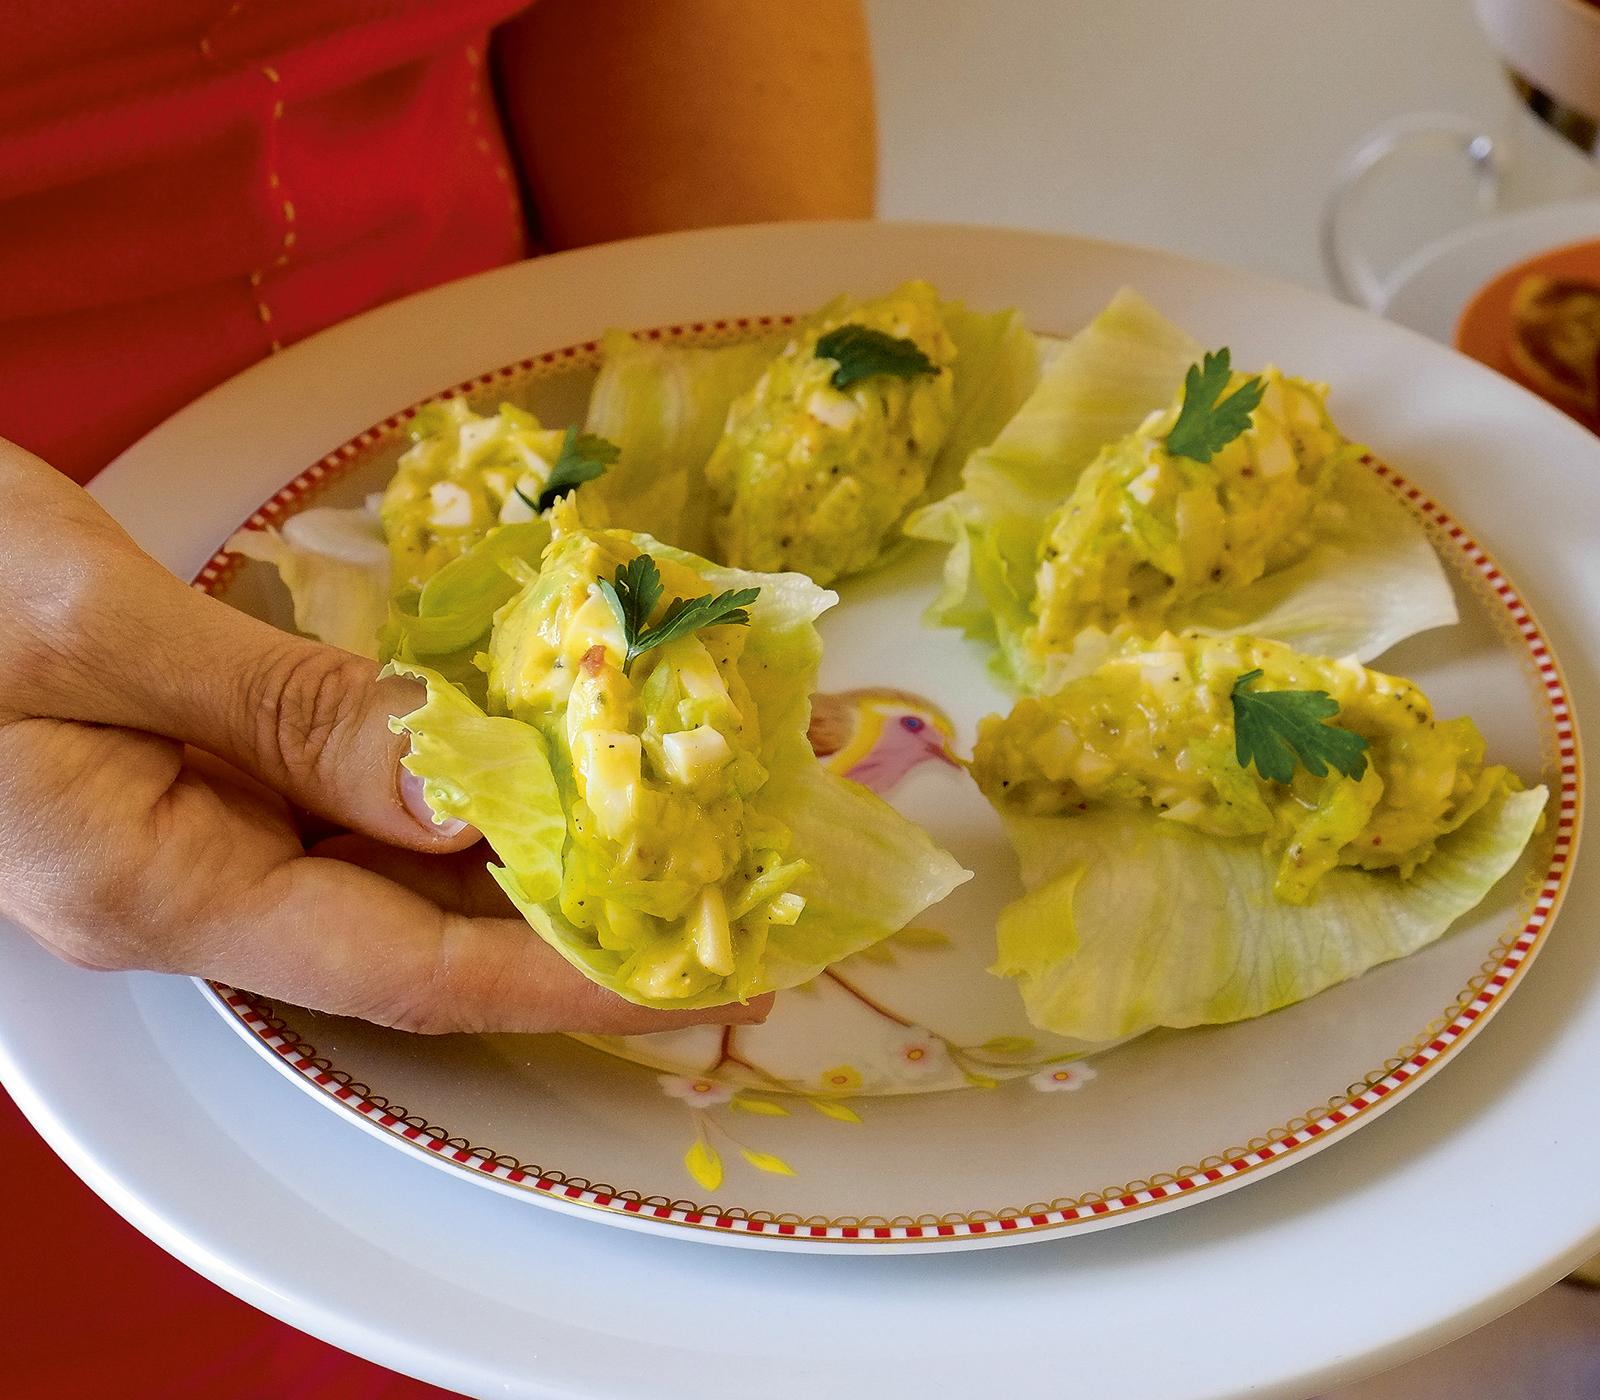 Avocado-Eier-Salat im Eisbergblatt - Annemarie Wildeisen's KOCHEN